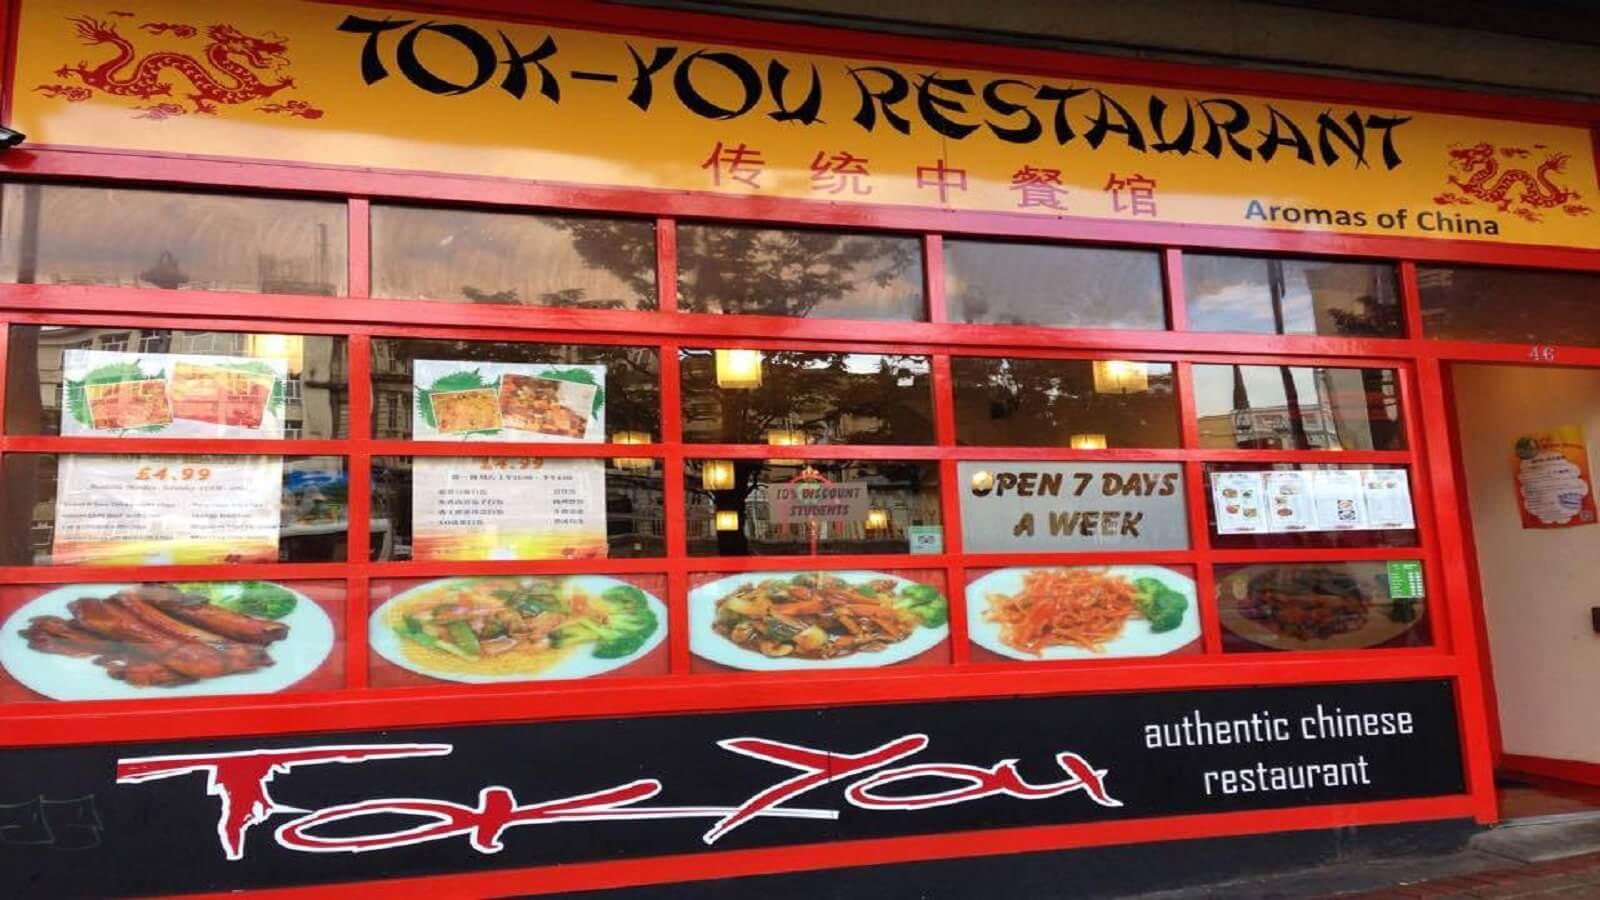 Tokyou Chinese Restaurant